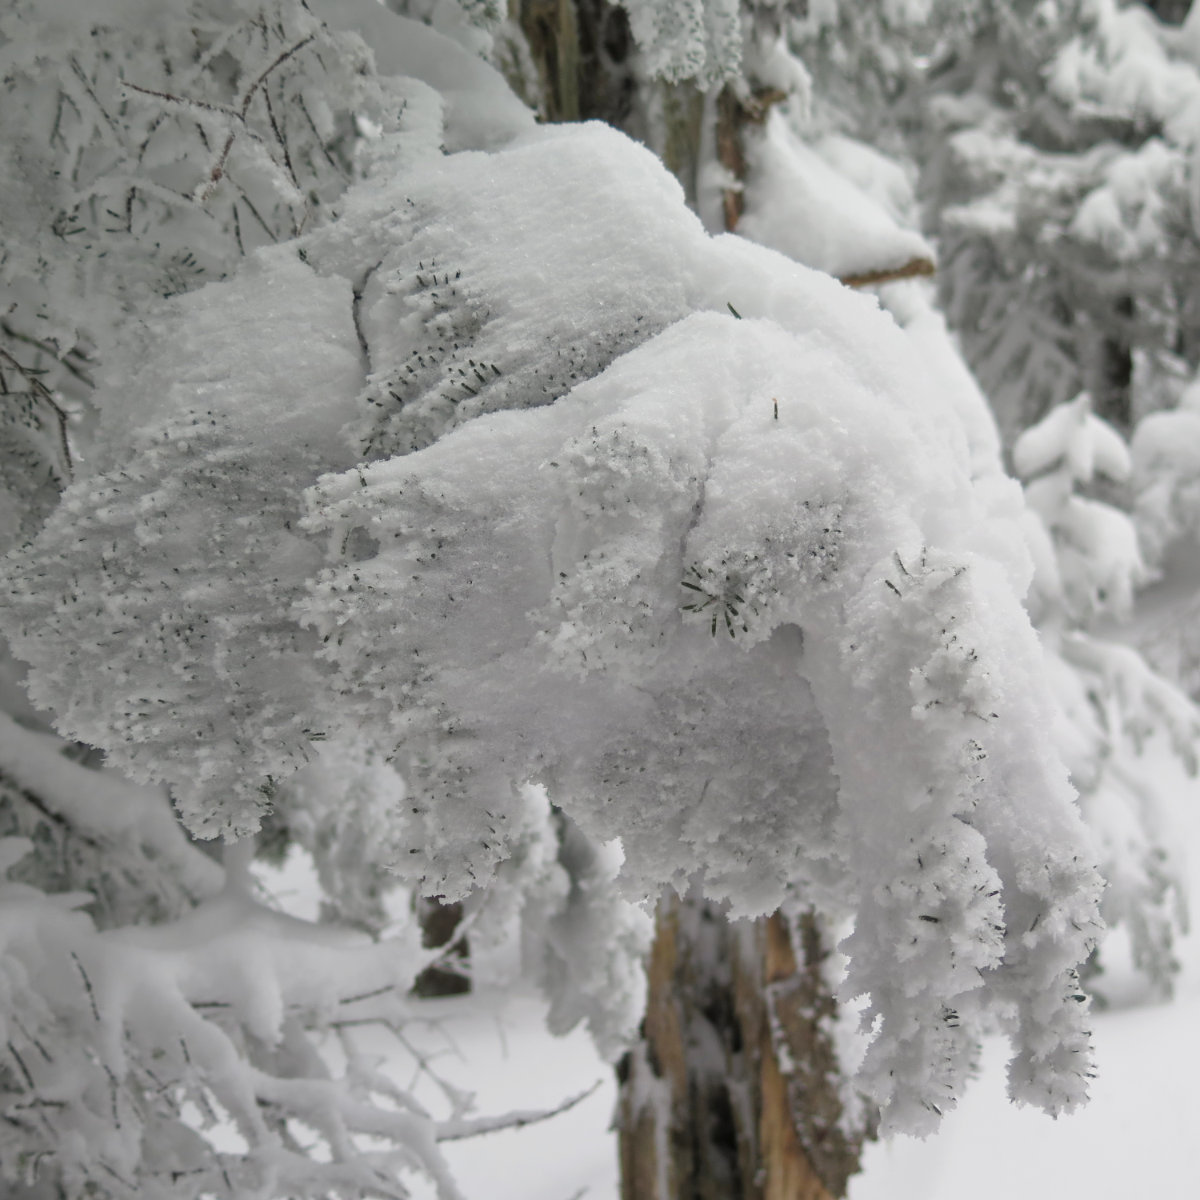 Waumbek-Snowy-Branch-20190202